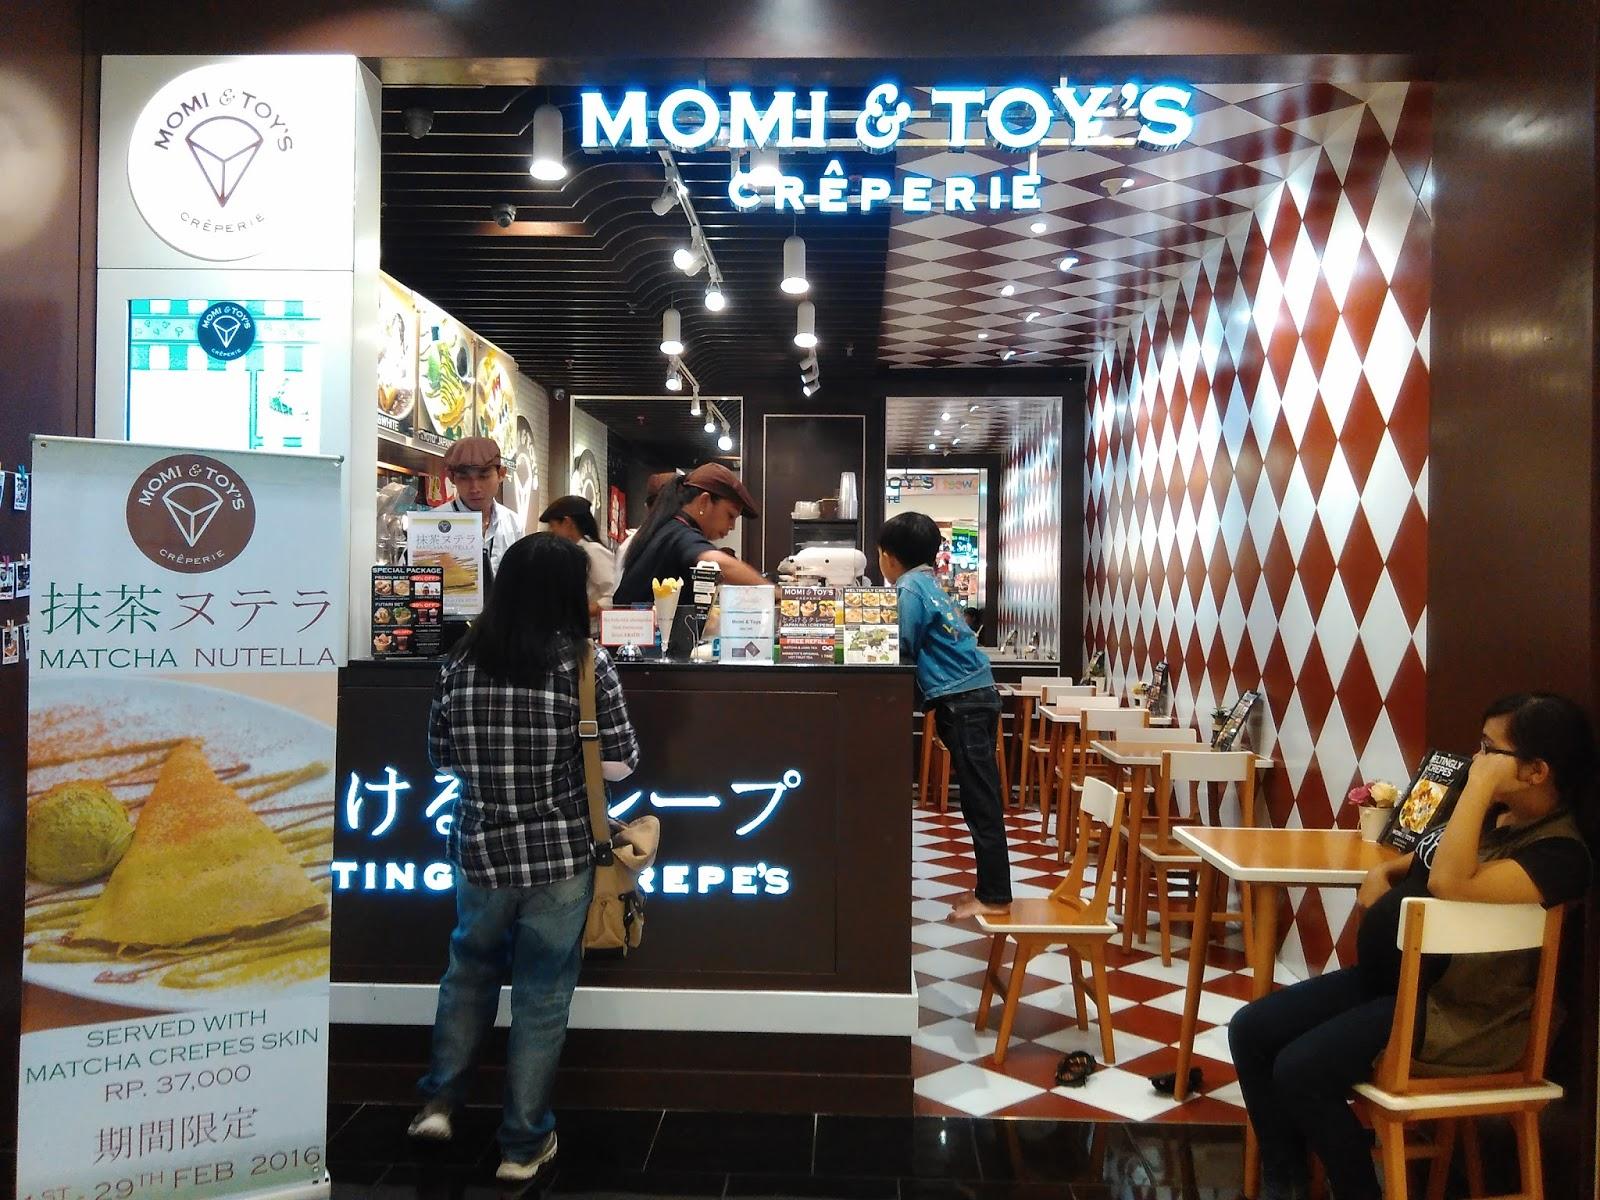 Momi   Toy s Creperie    Tunjungan Plaza 3 Lantai 5 Surabaya  c76265a49e